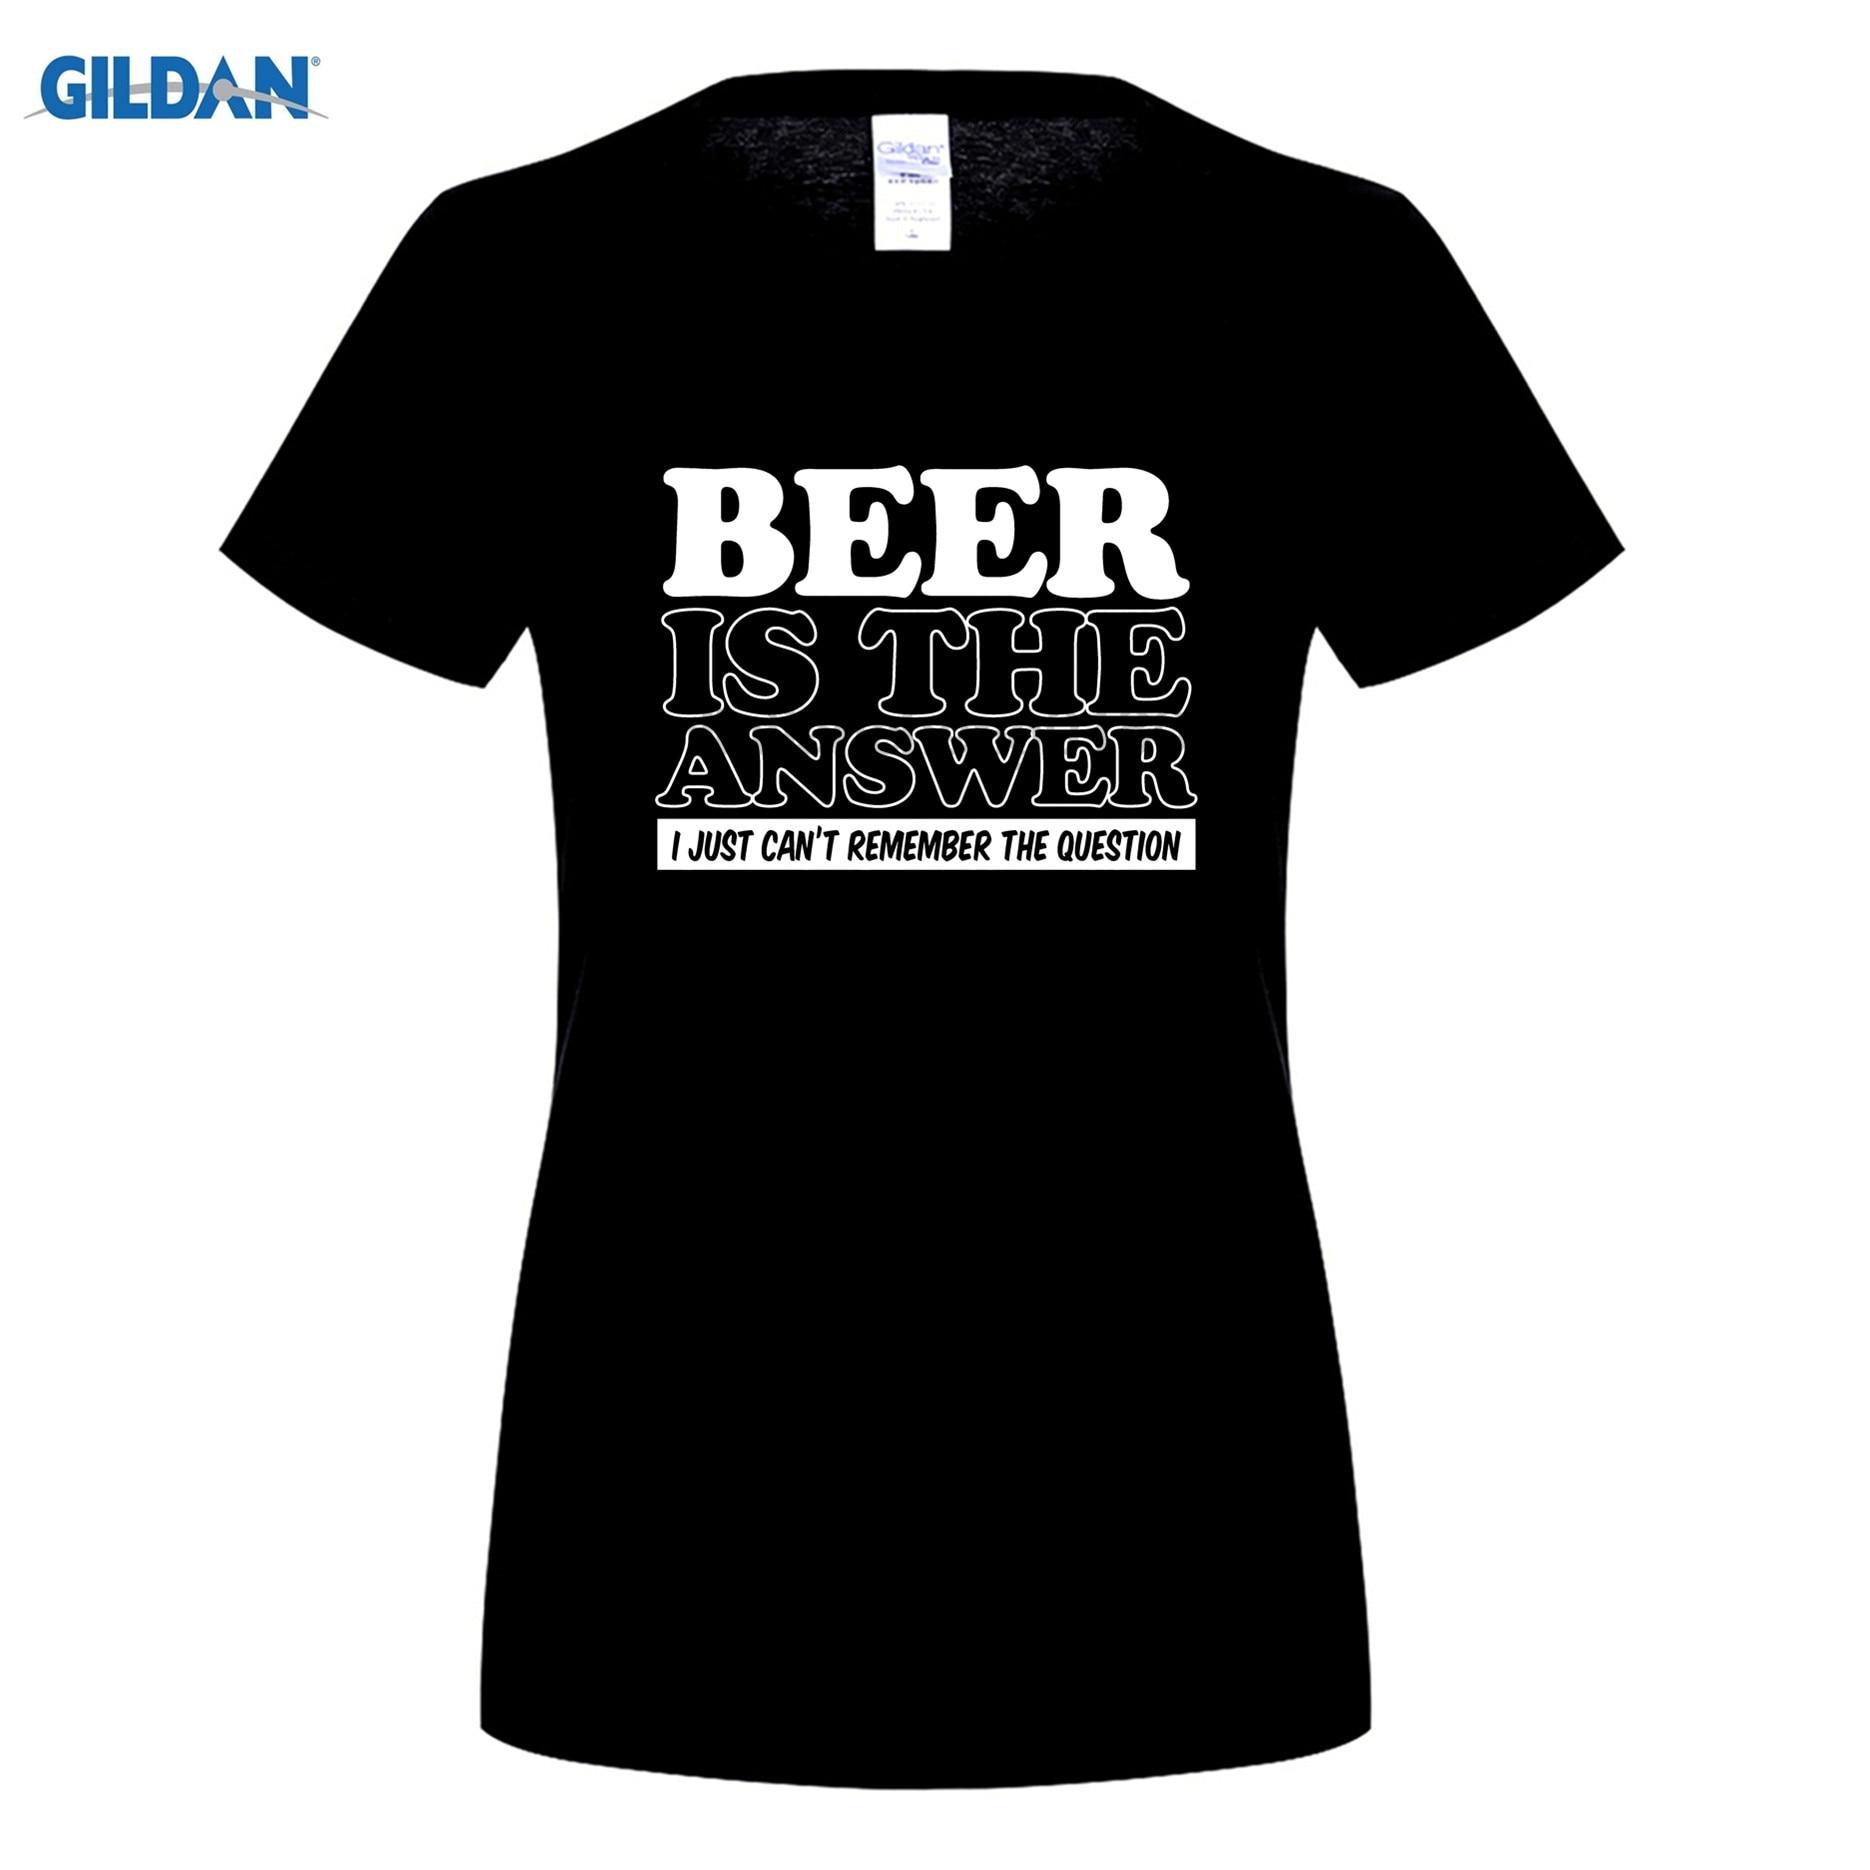 GILDAN Biere Is The Answer Drole T Shirt Pour s Papa Fete Des Peres CAMRA Real Ale Summer Style Hip Hop women T Shirt Tops